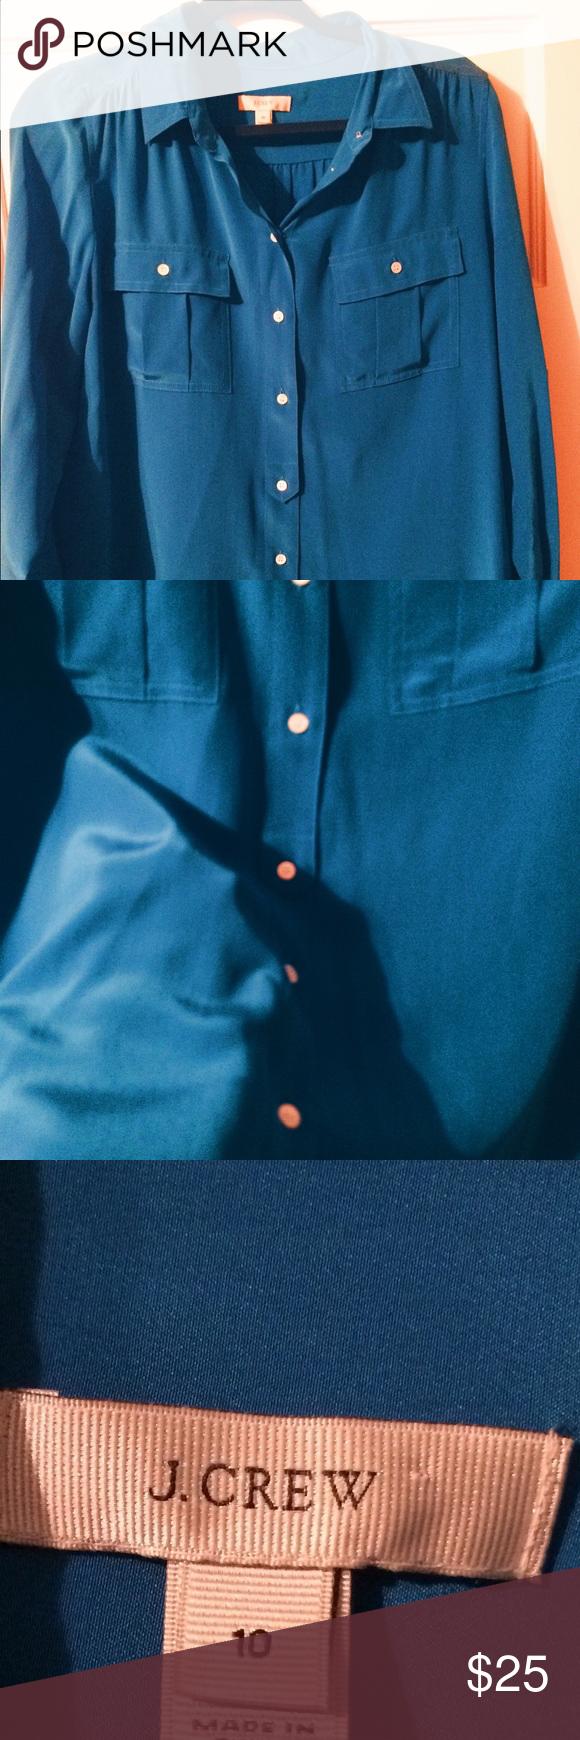 J crew sz 10 silk button up shirt blue cobalt 100% silk! Pretty cobalt color. Sz 10. Only worn a couple times J. Crew Tops Blouses